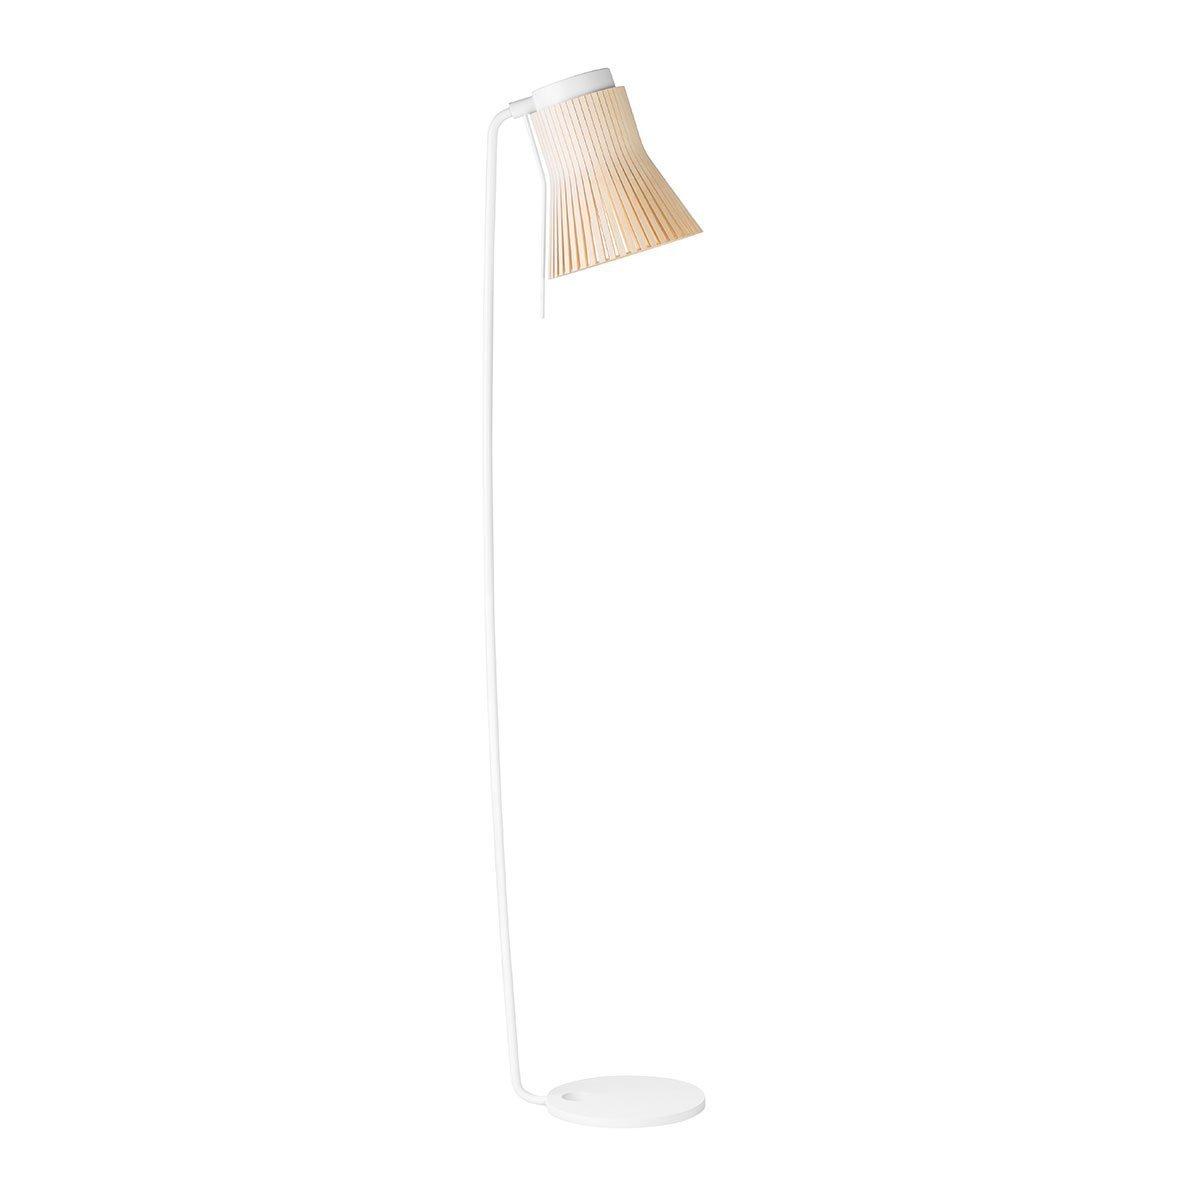 Secto Design Petite 4610 Vloerlamp - Beuken